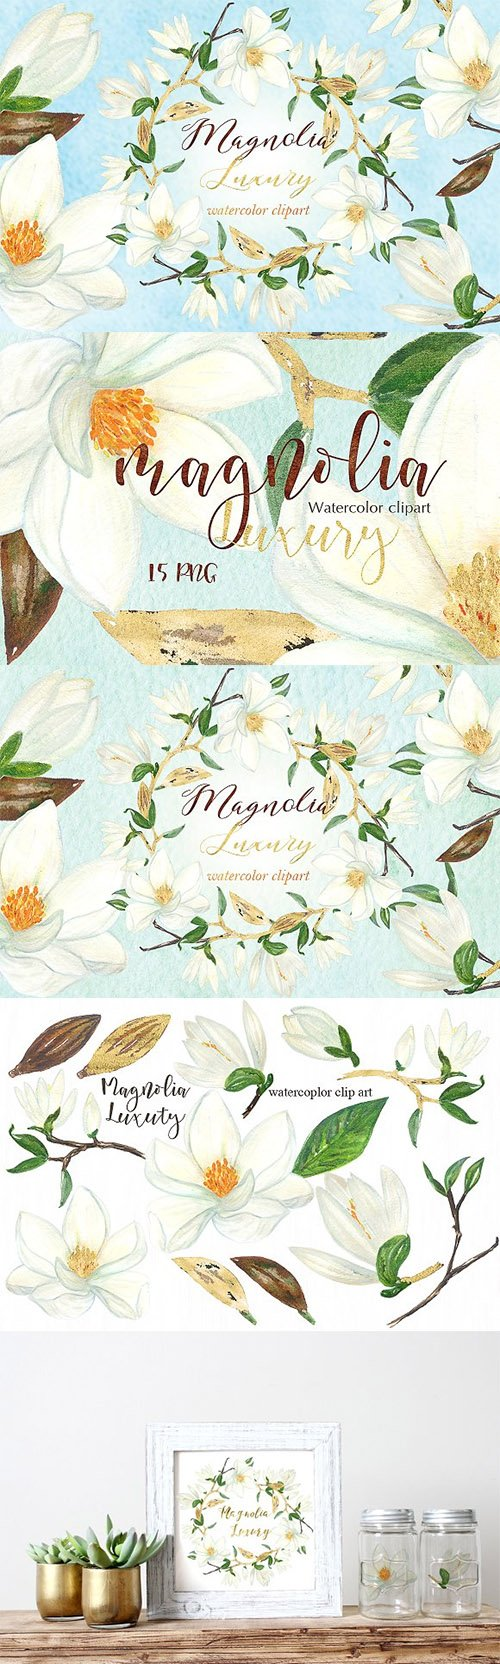 Magnolia white luxury clipart.